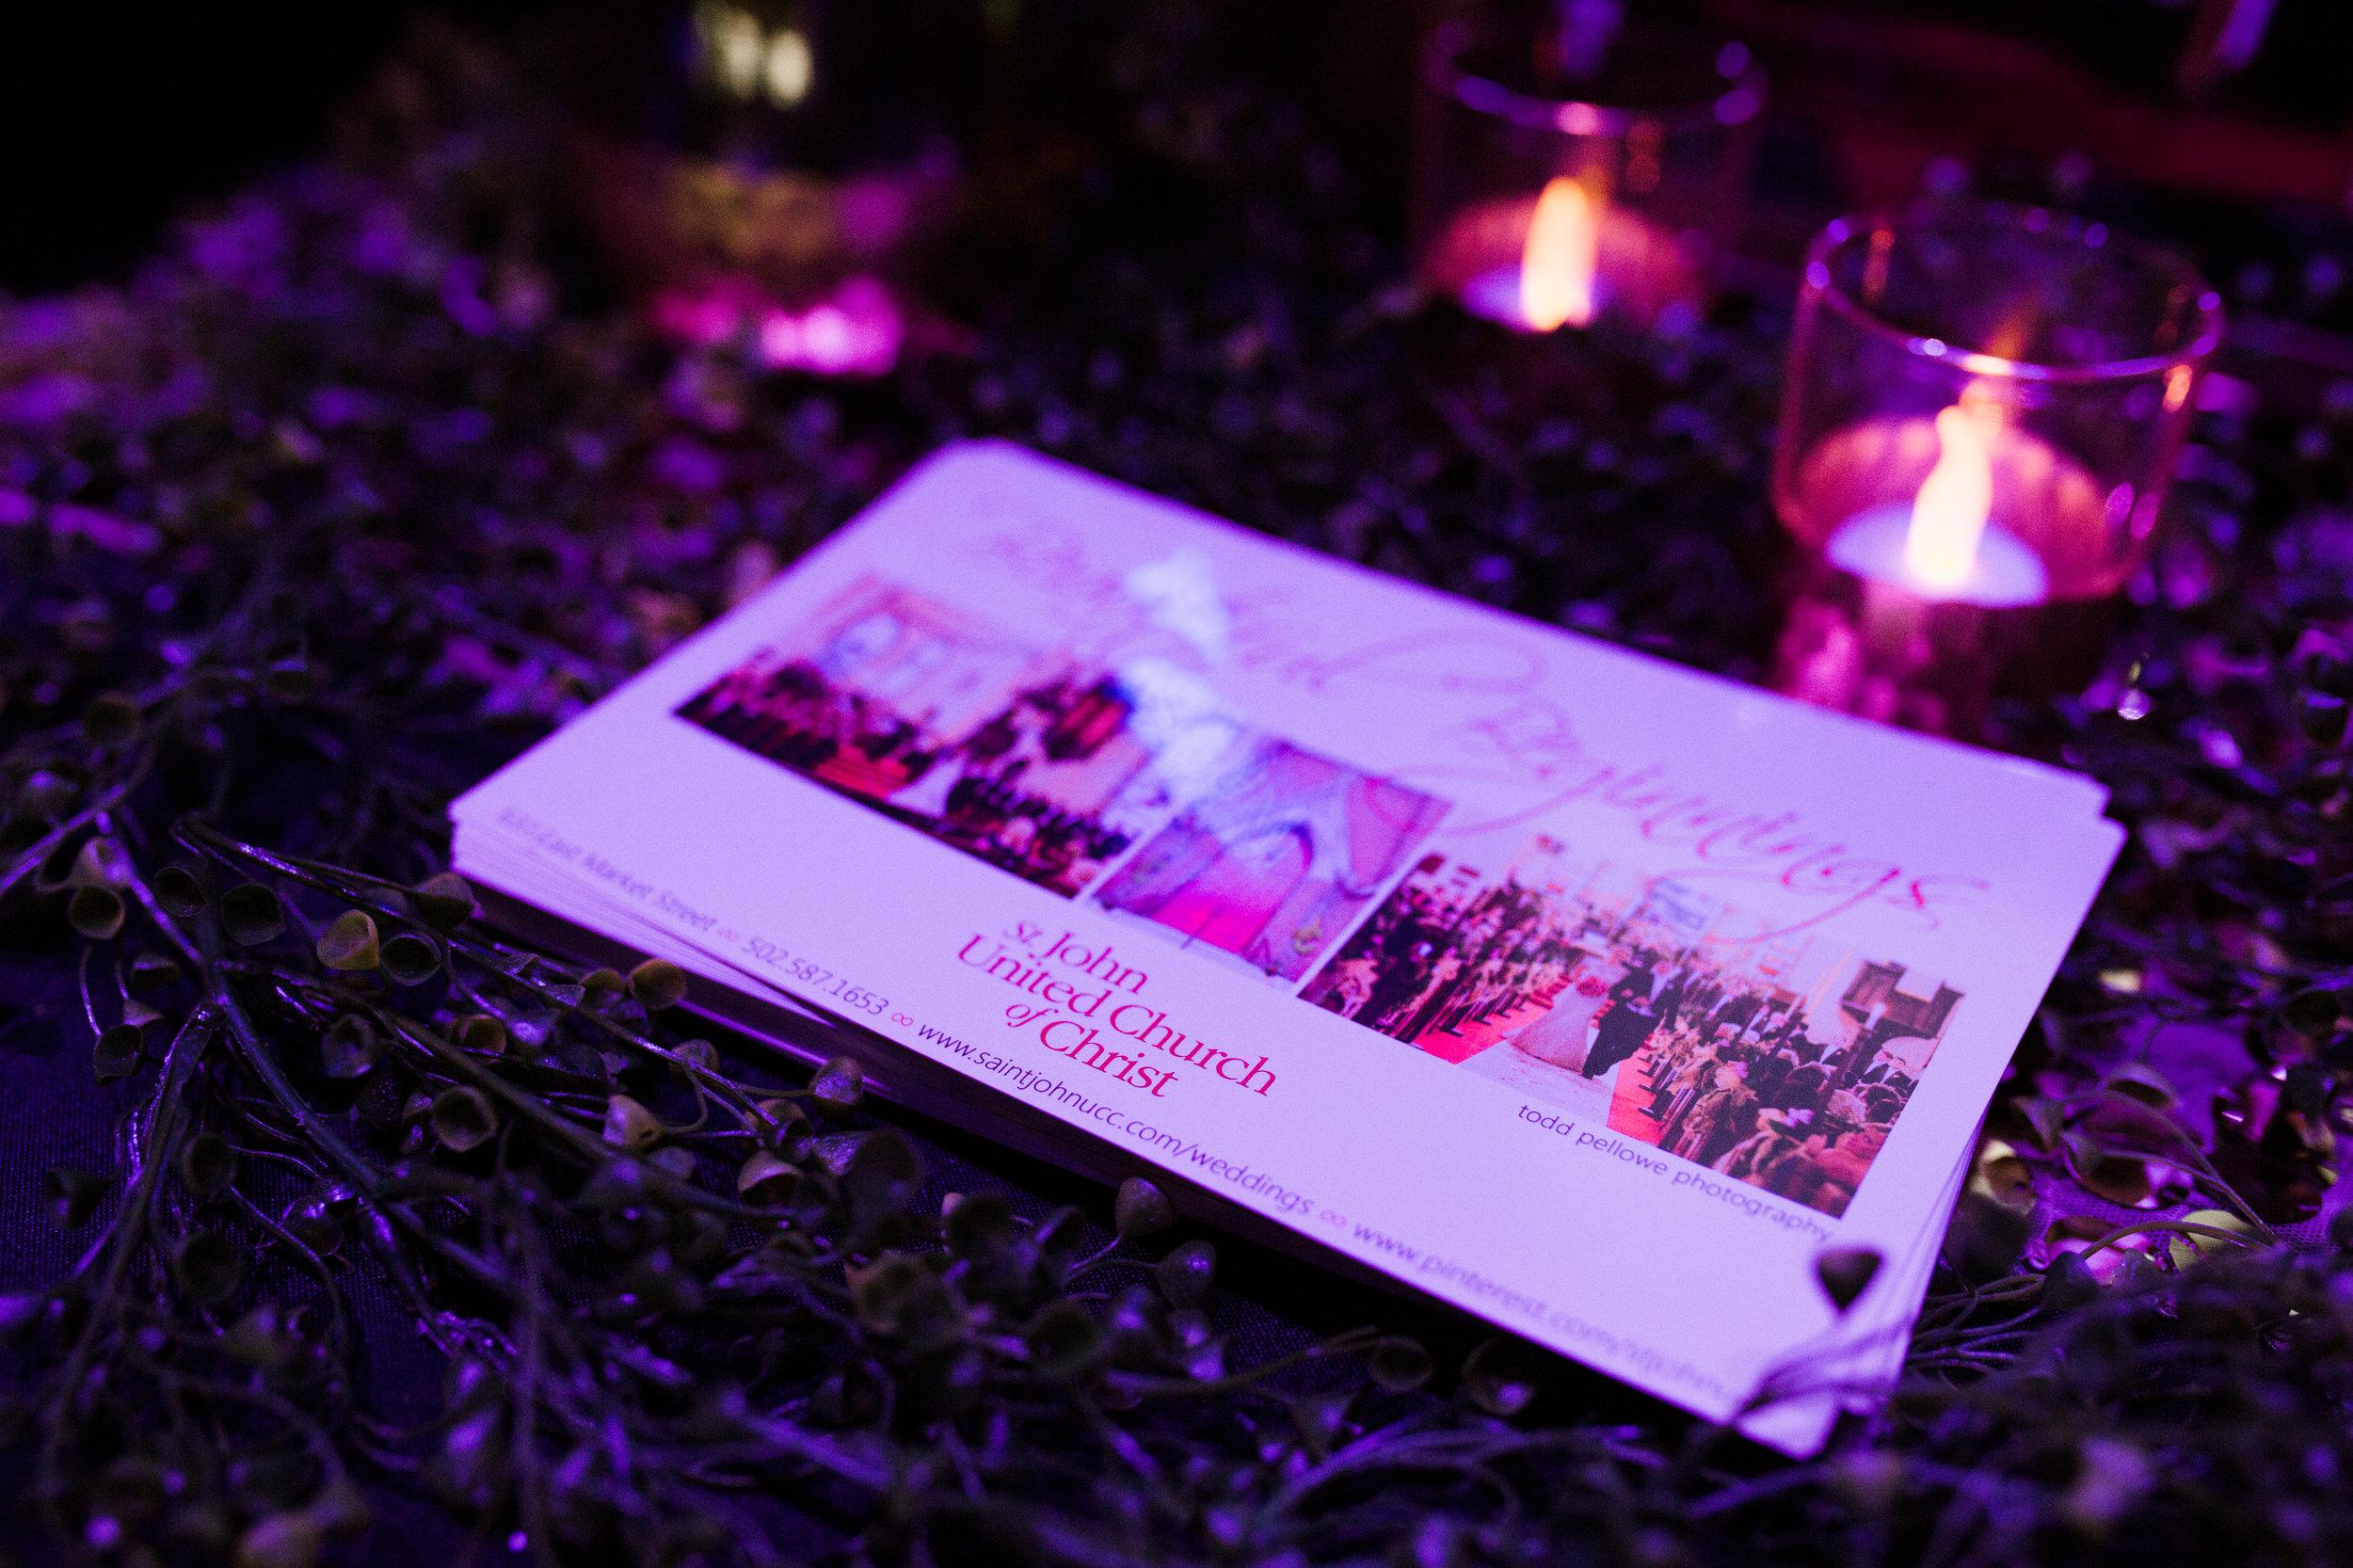 Modern Louisville Magazine Modern Vows Launch Party at Mercury Ballroom 5-17-17 Crystal Ludwick Photo 11.jpg